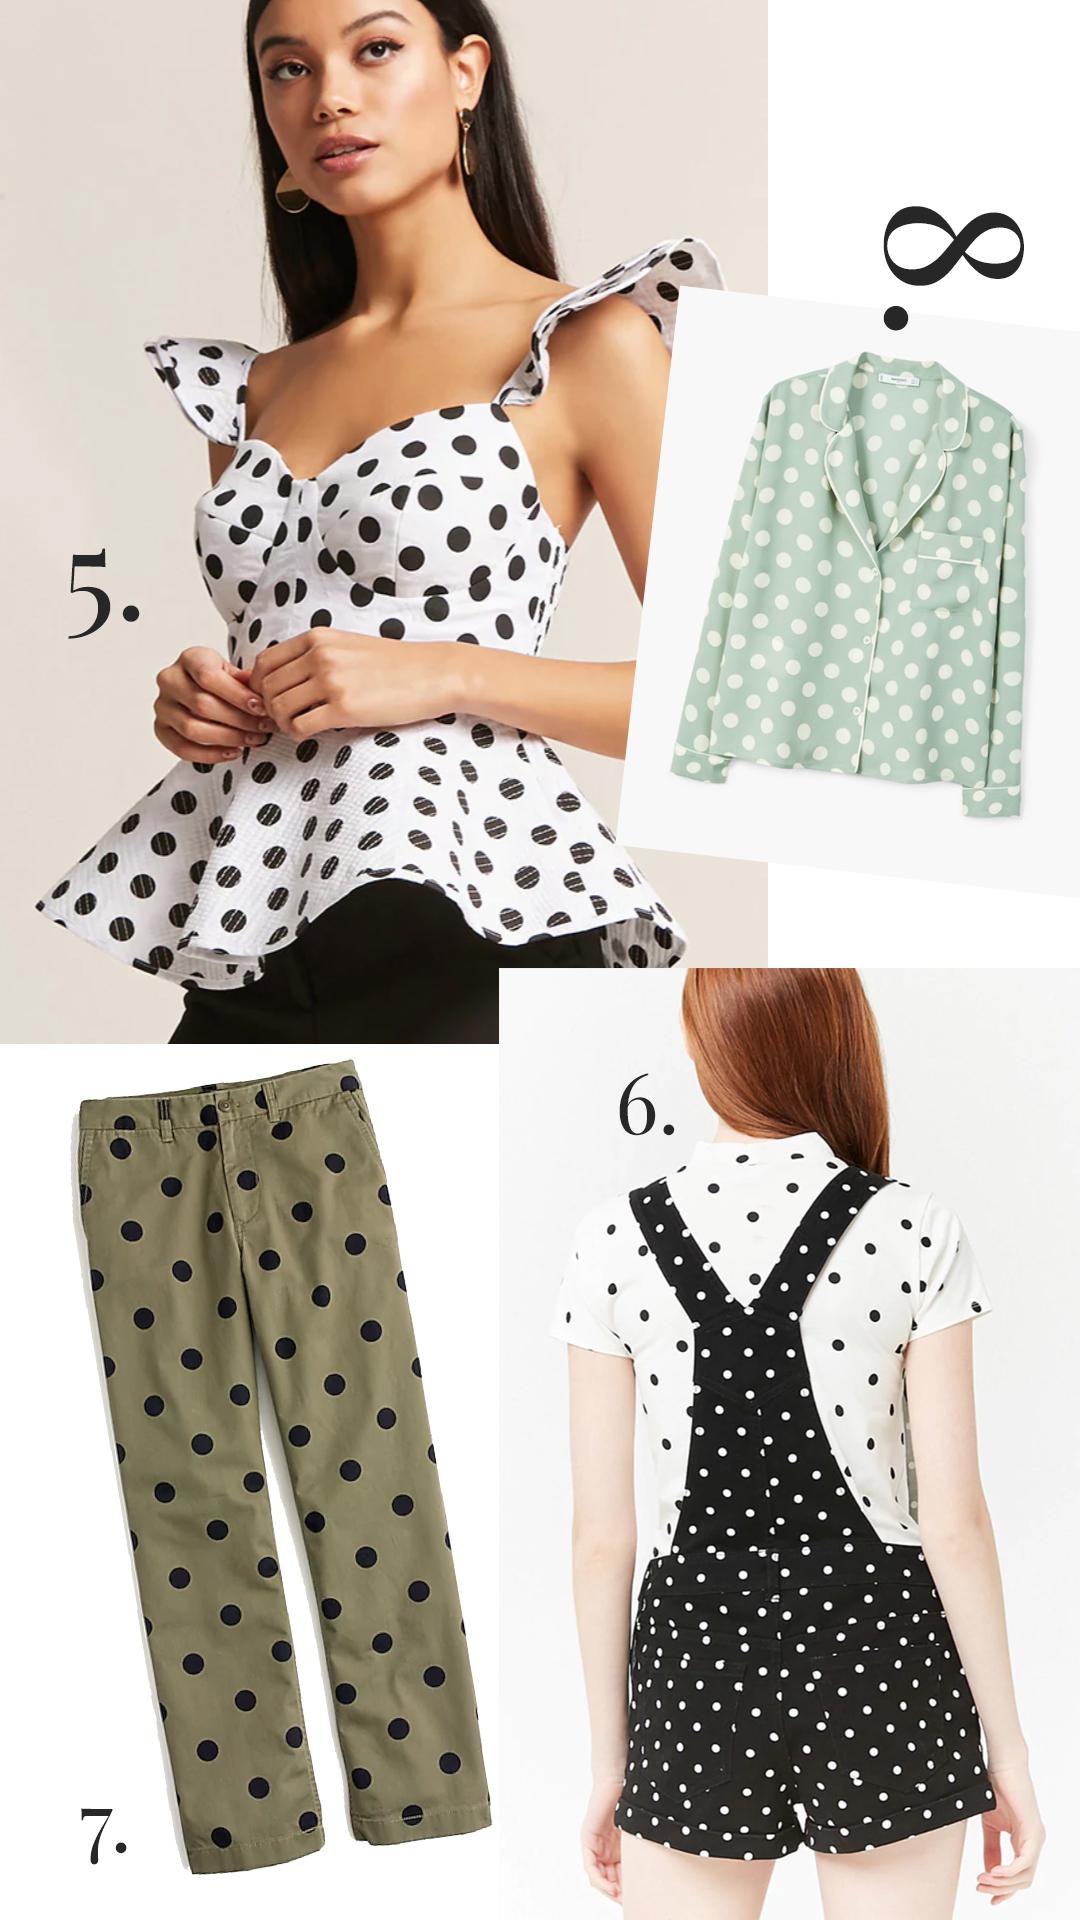 2Polka-dot-report-shop-polka-dot-outfits.jpg